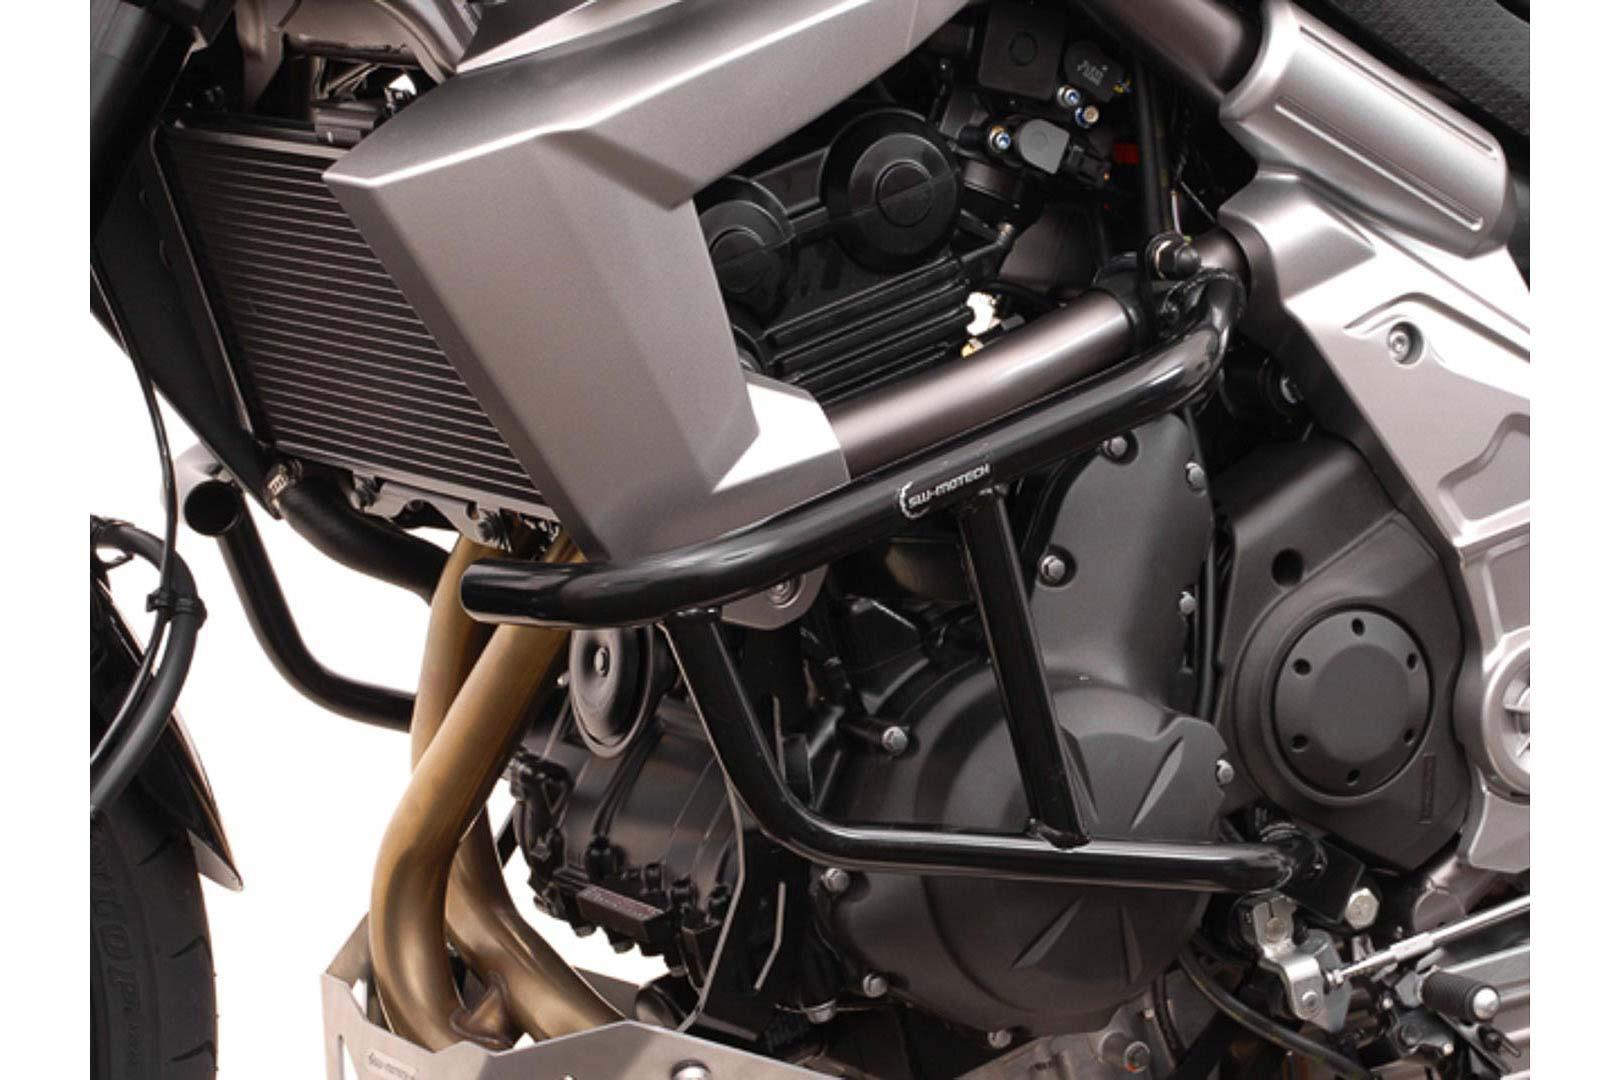 SW-Motech Moottorinsuojarauta Kawasaki Versys musta